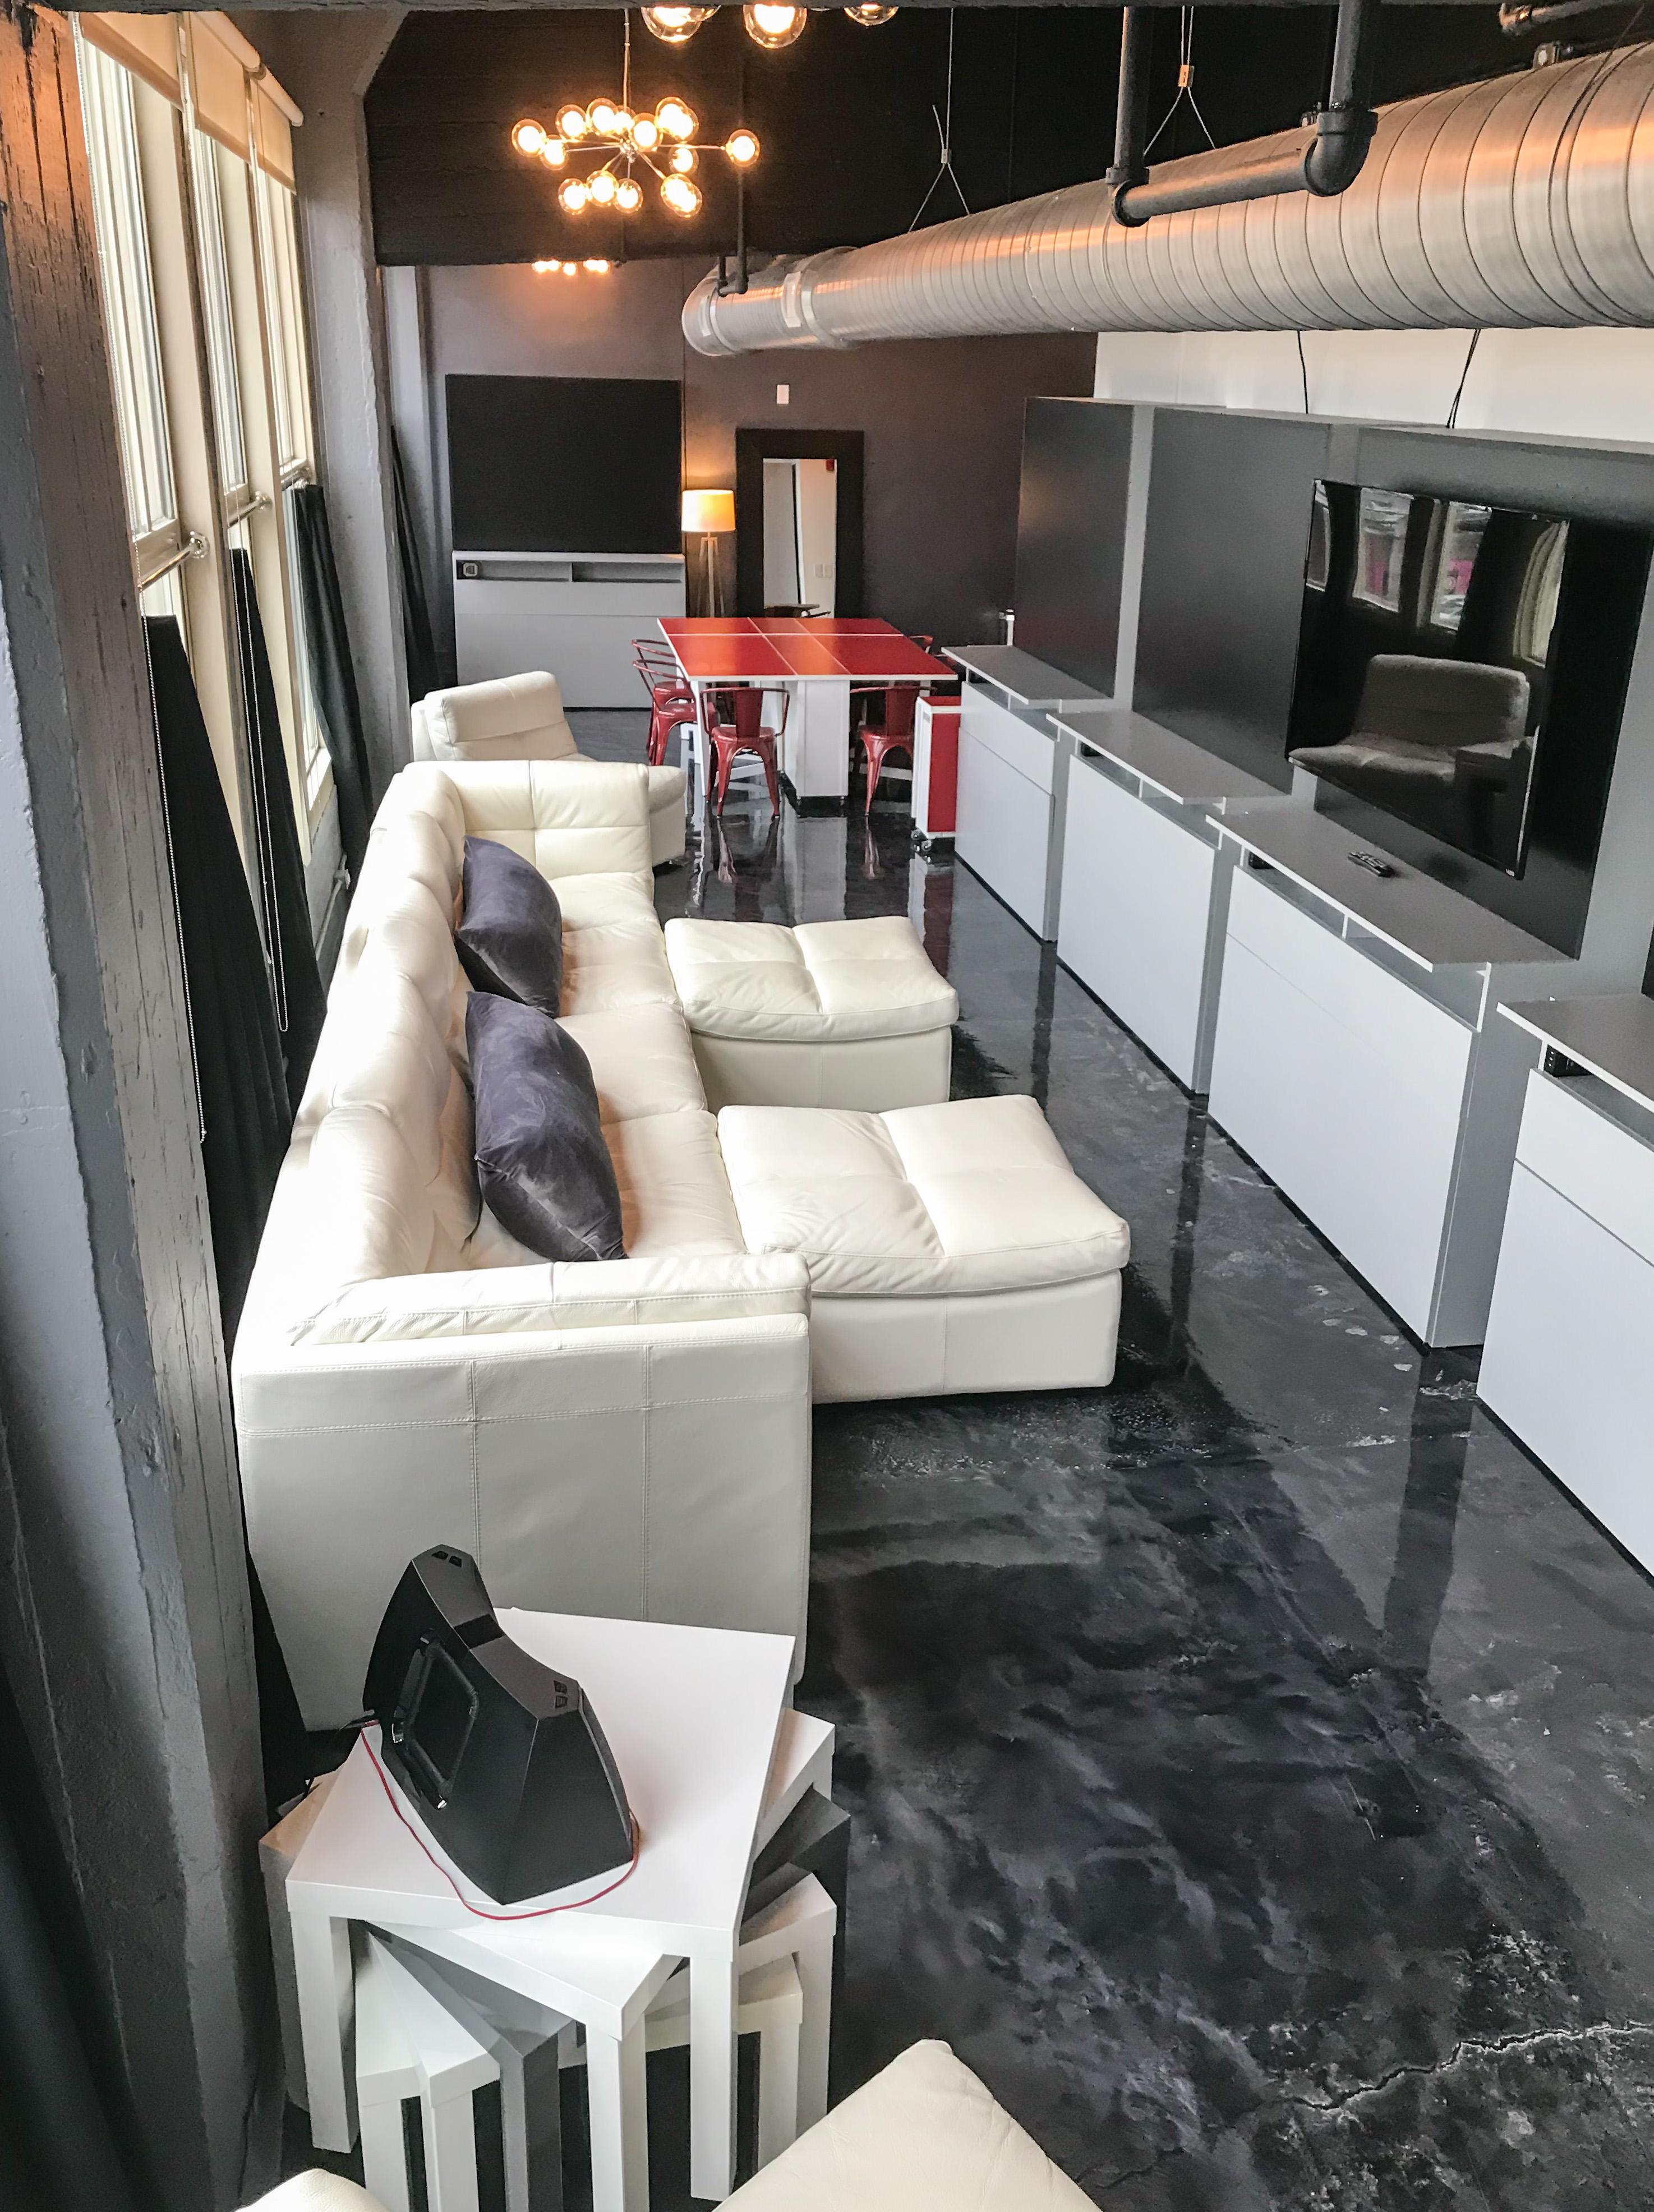 Loft Reverie Hotel 803 - Lounge Pit + Cloud Sofa + Tall Windows + Open Loft + Dining + Mirror + HDTV